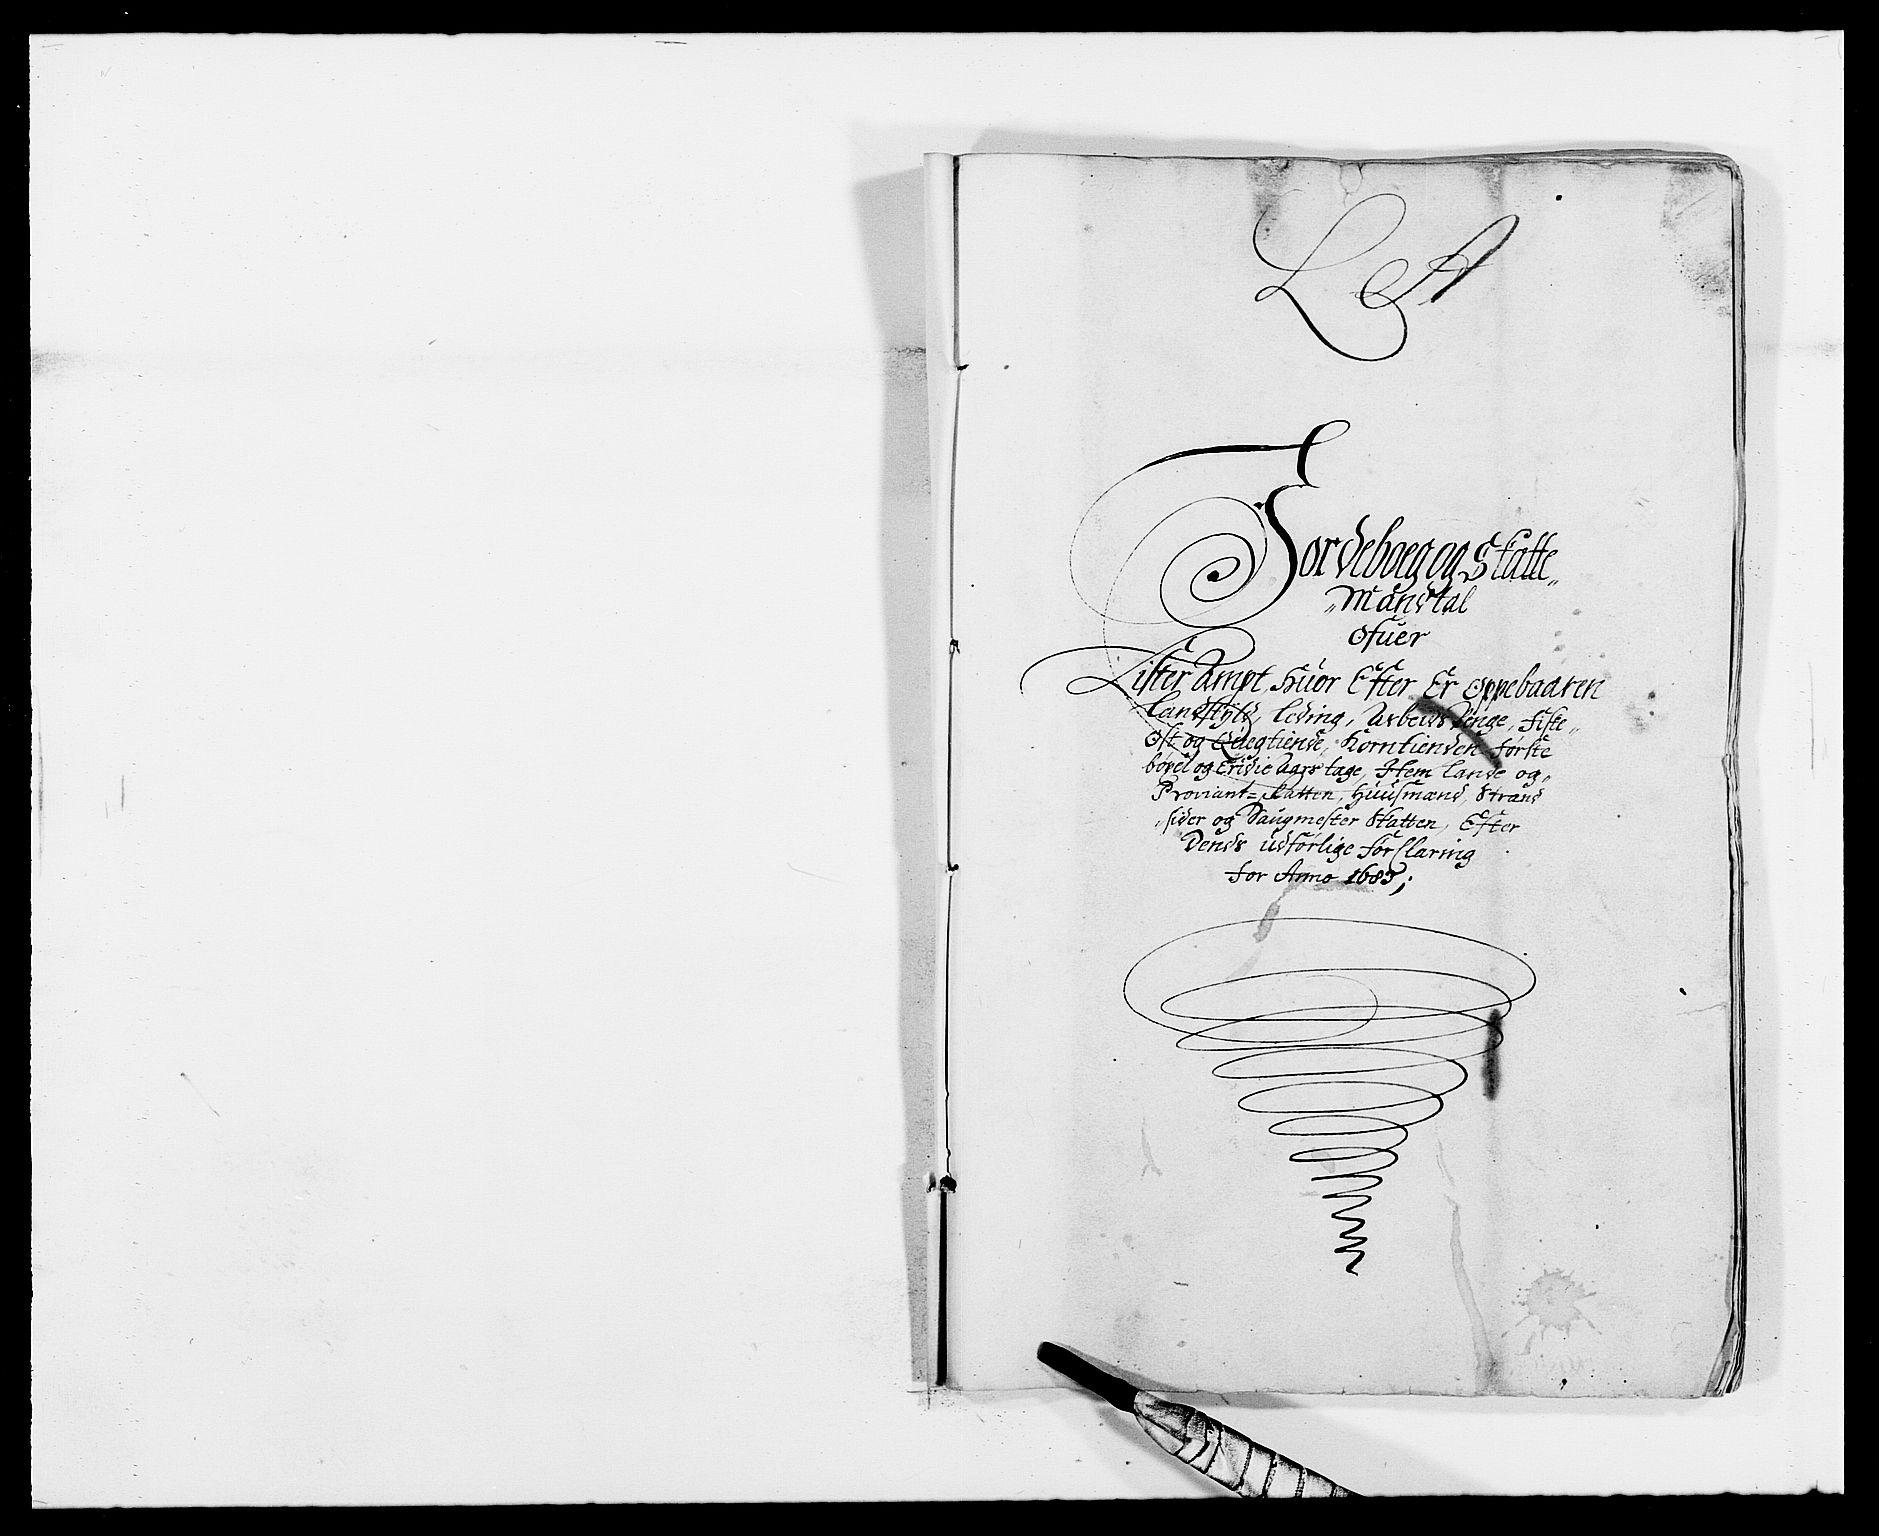 RA, Rentekammeret inntil 1814, Reviderte regnskaper, Fogderegnskap, R41/L2532: Fogderegnskap Lista, 1683, s. 7